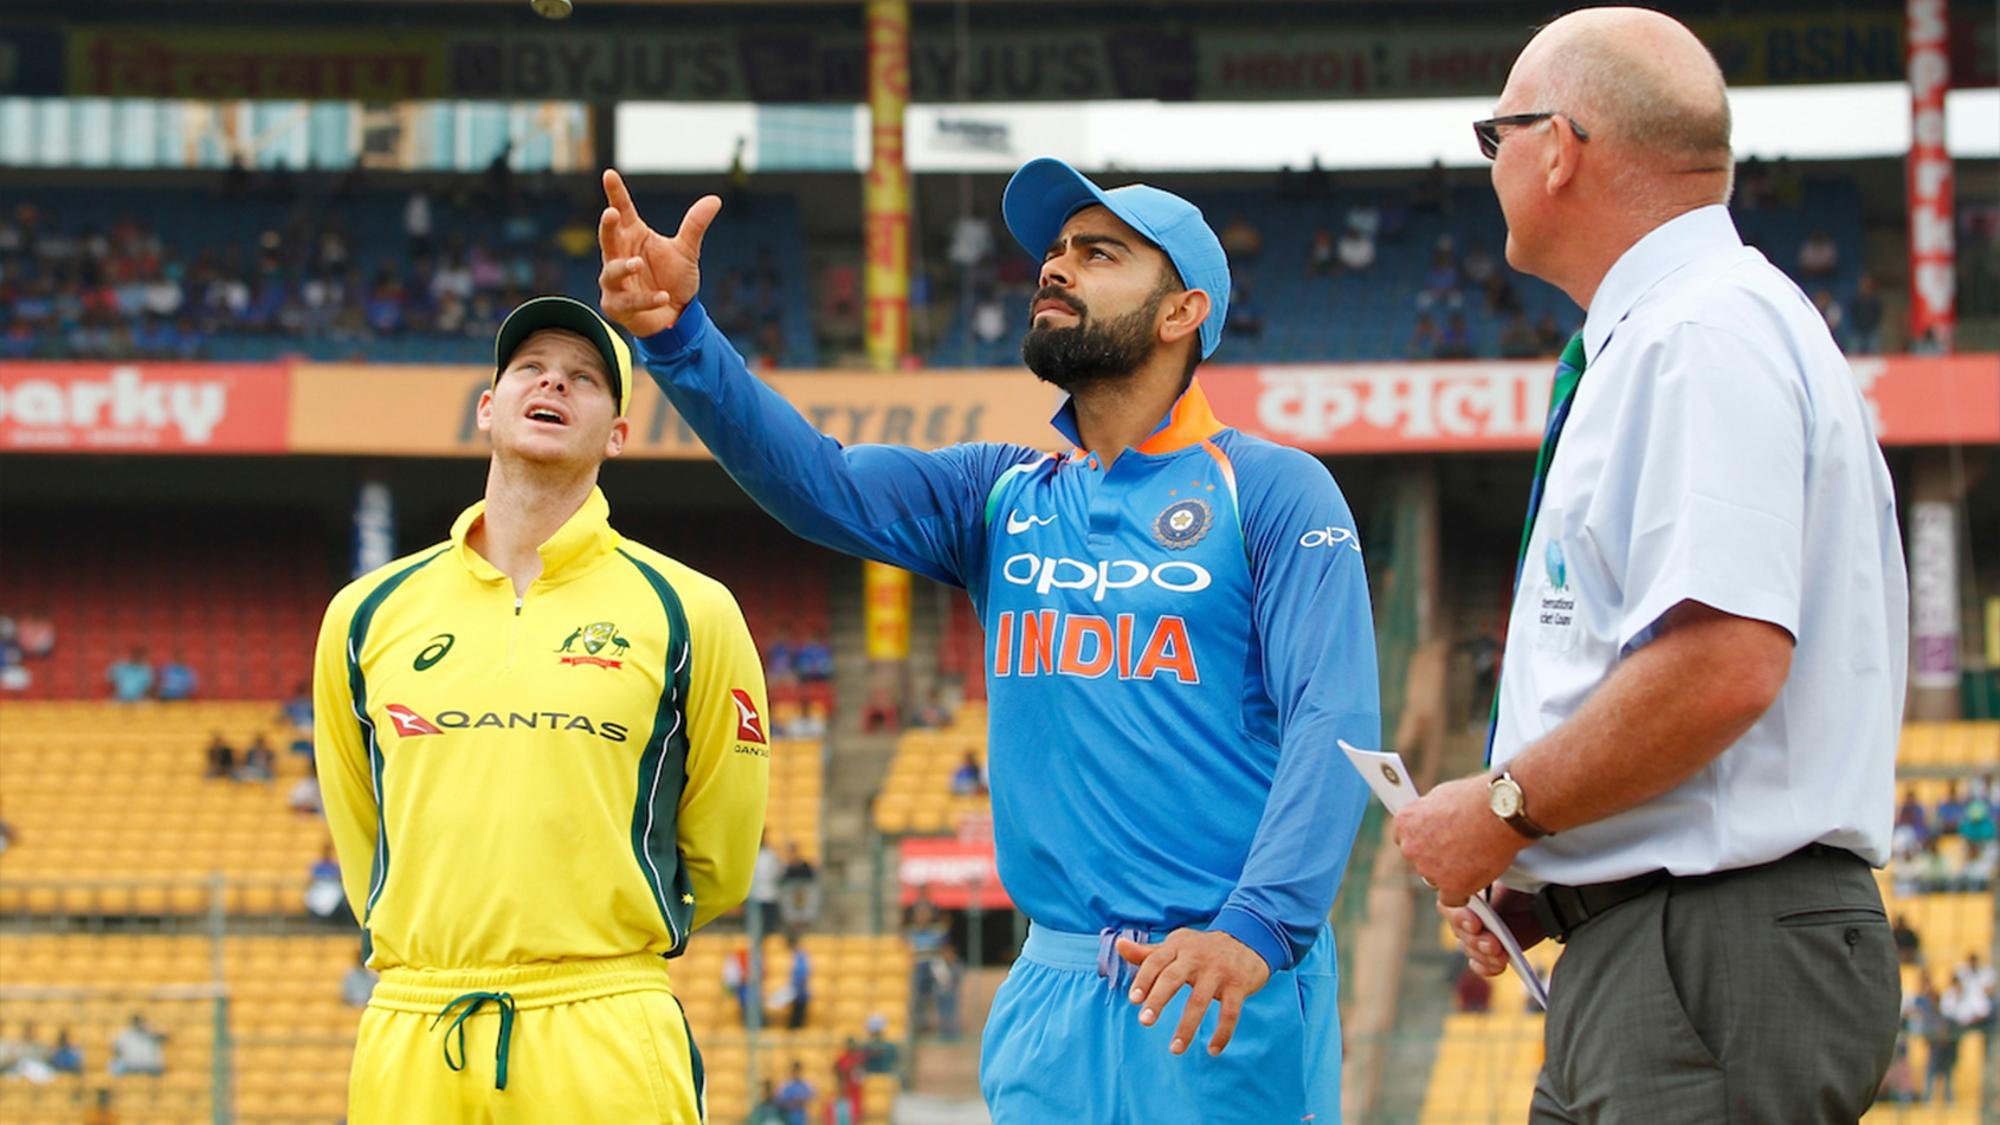 Australian cricketer Hilton Cartwright loose his wicket to India's Jaspreet Bumrah